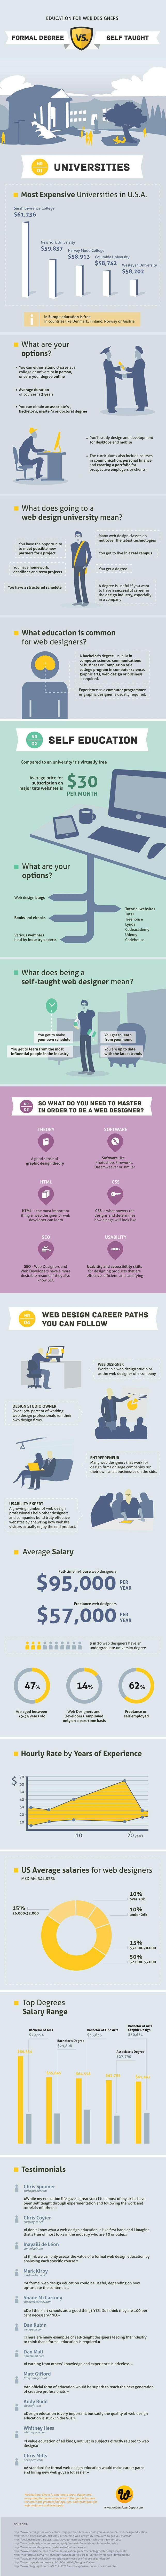 Web Designer Education-Infographic